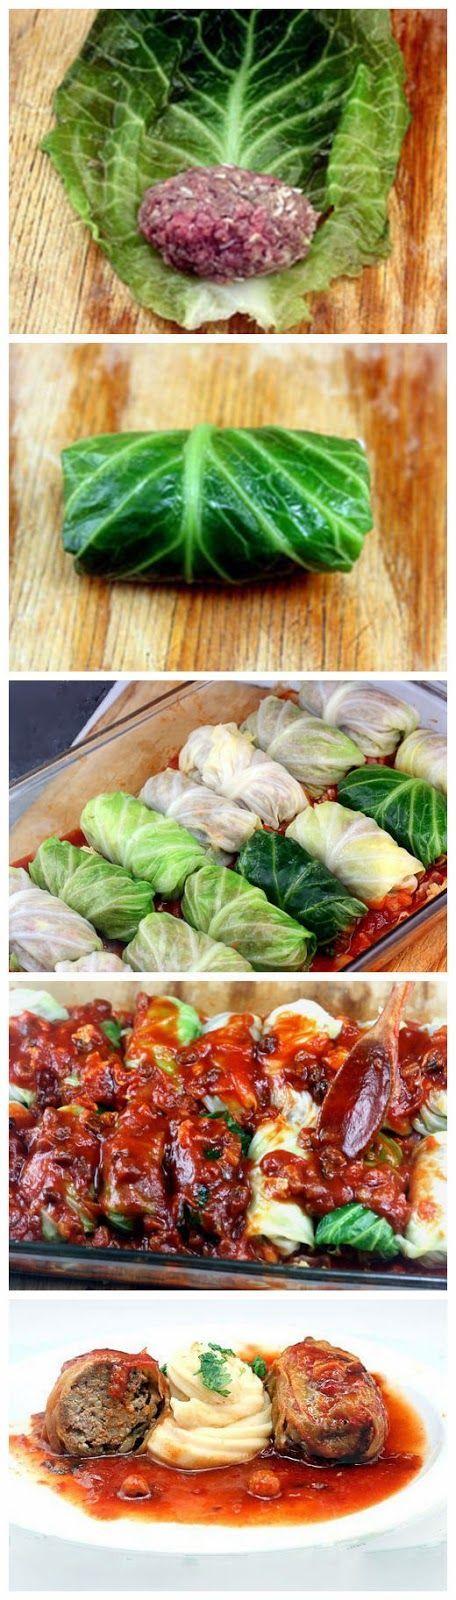 Amazing Stuffed Cabbage Rolls with turkey, chicken or beef ~ yummykey